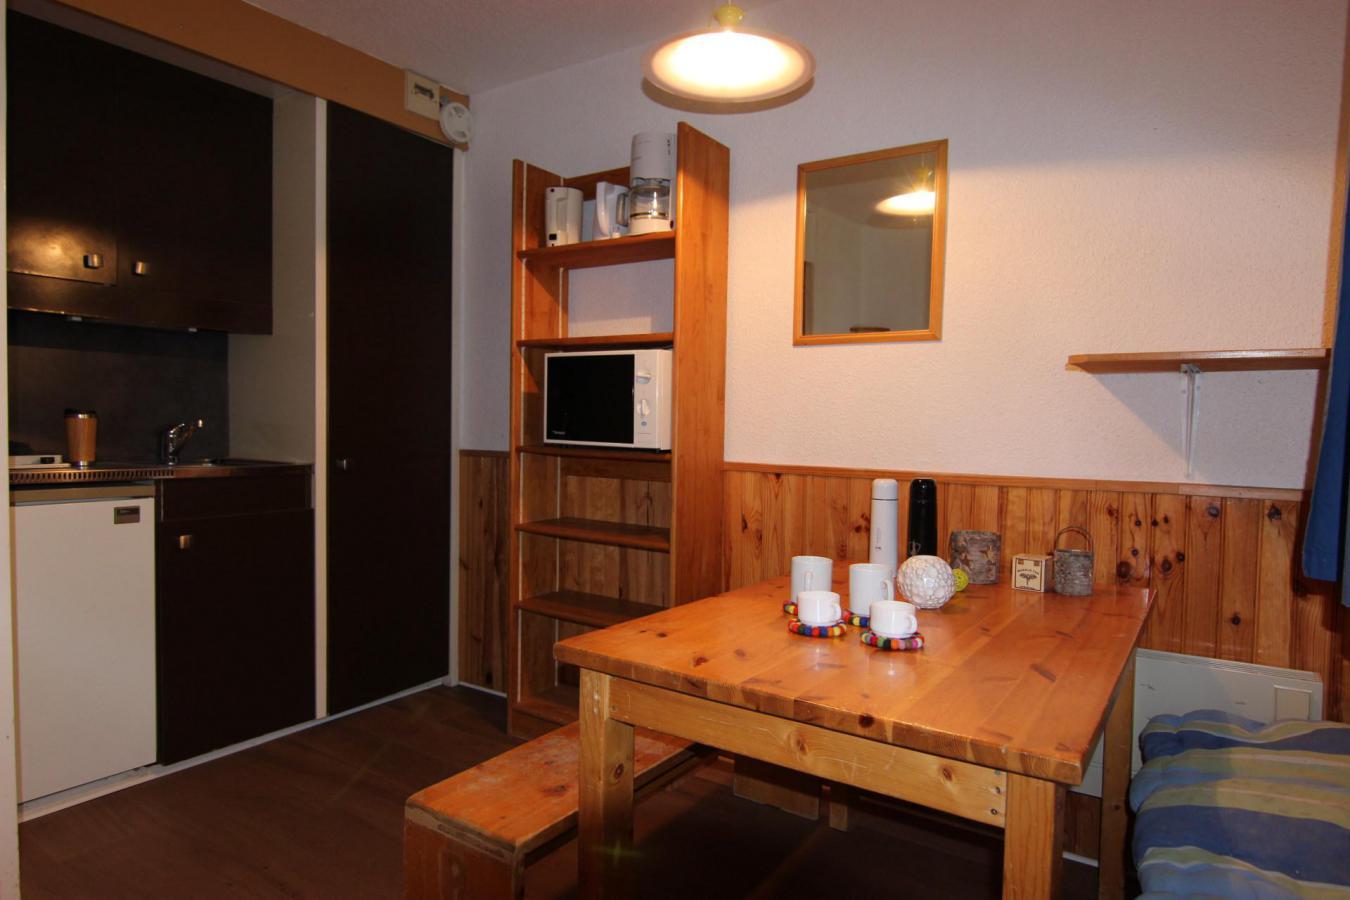 Location au ski Studio 2 personnes (145) - Residence Roche Blanche - Val Thorens - Table